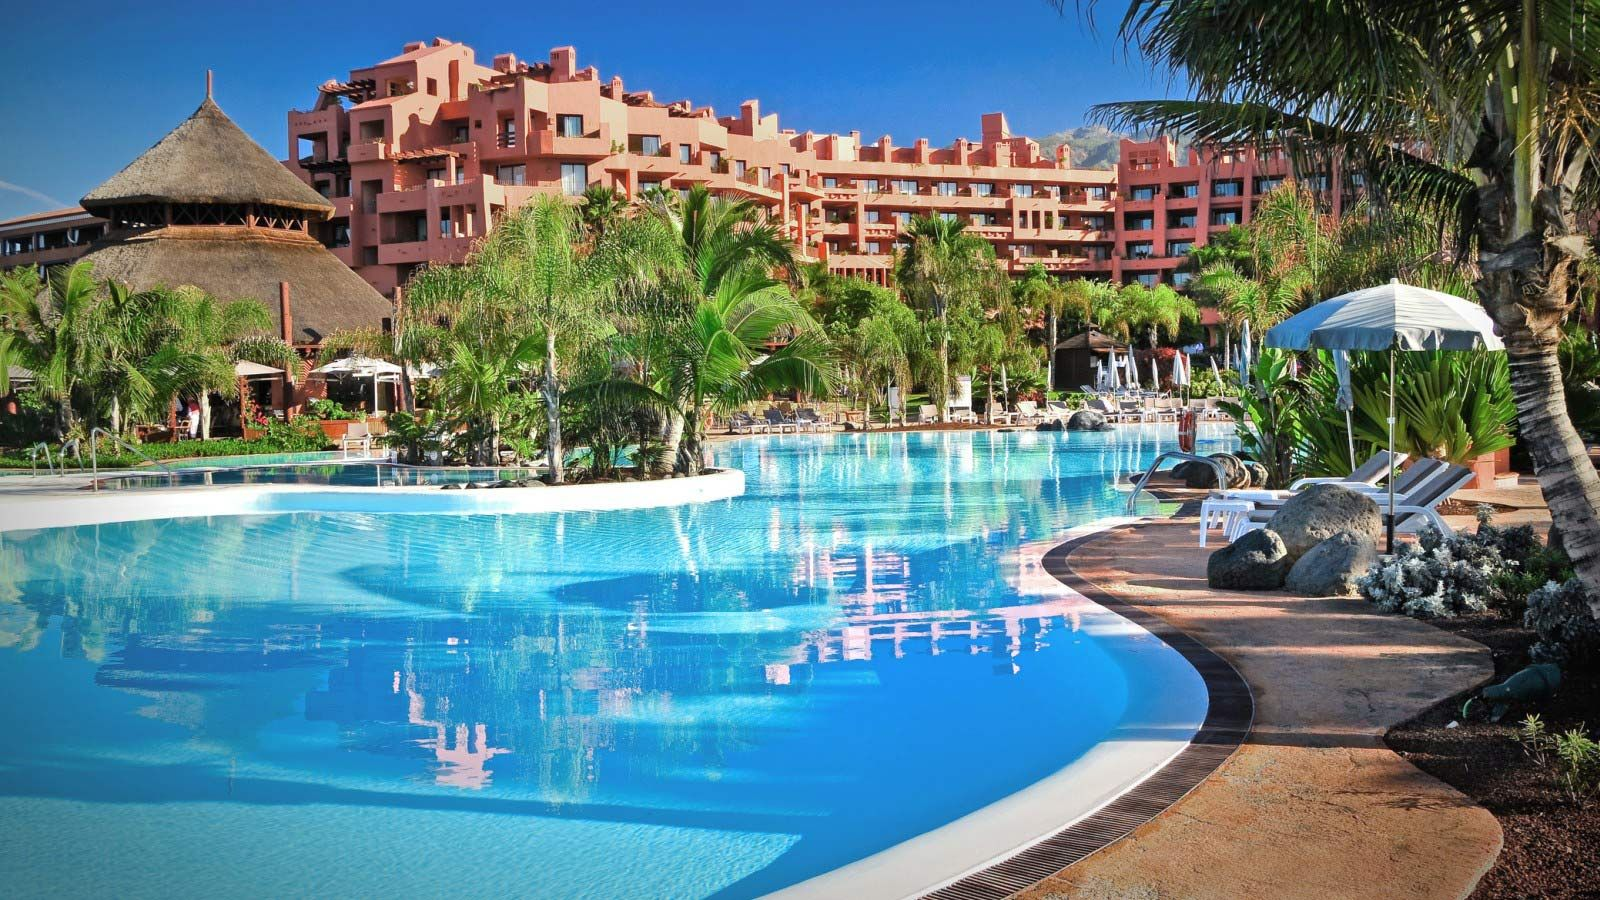 Hotel Sheraton La Caleta Resort and Spa Tenerife